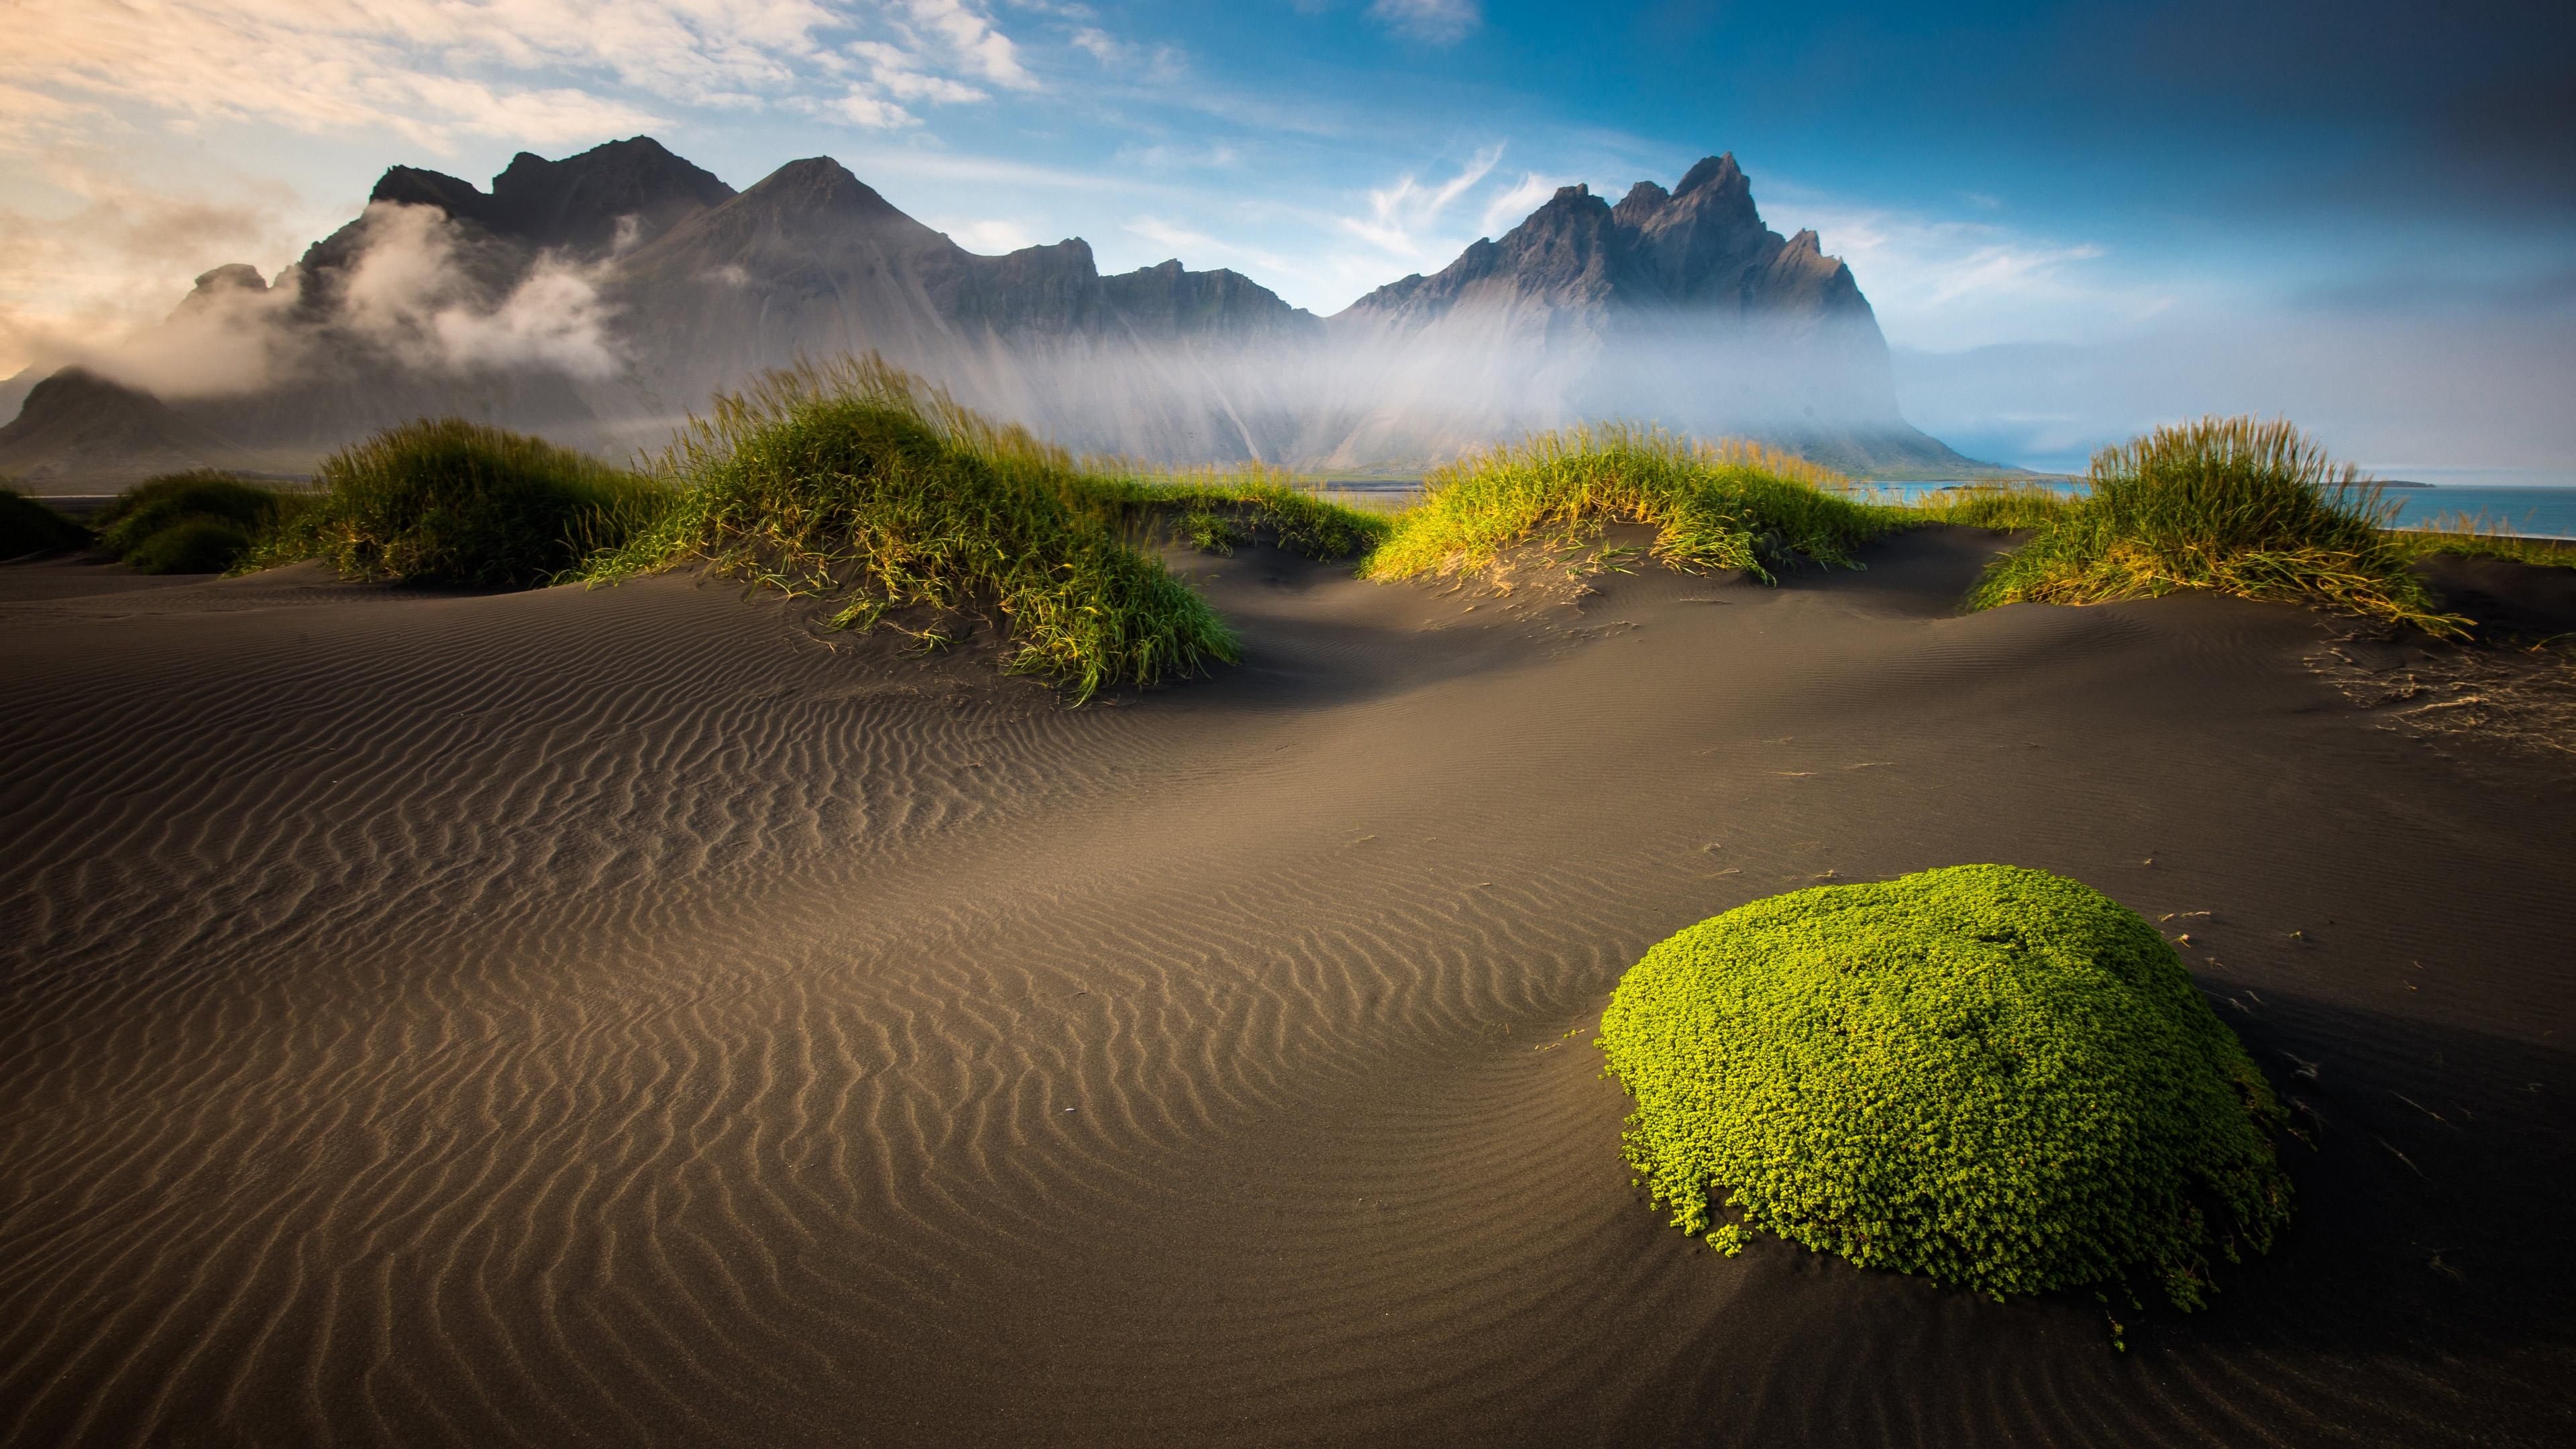 Icelandic Beach Landscape 3840 x 2160 3840x2160